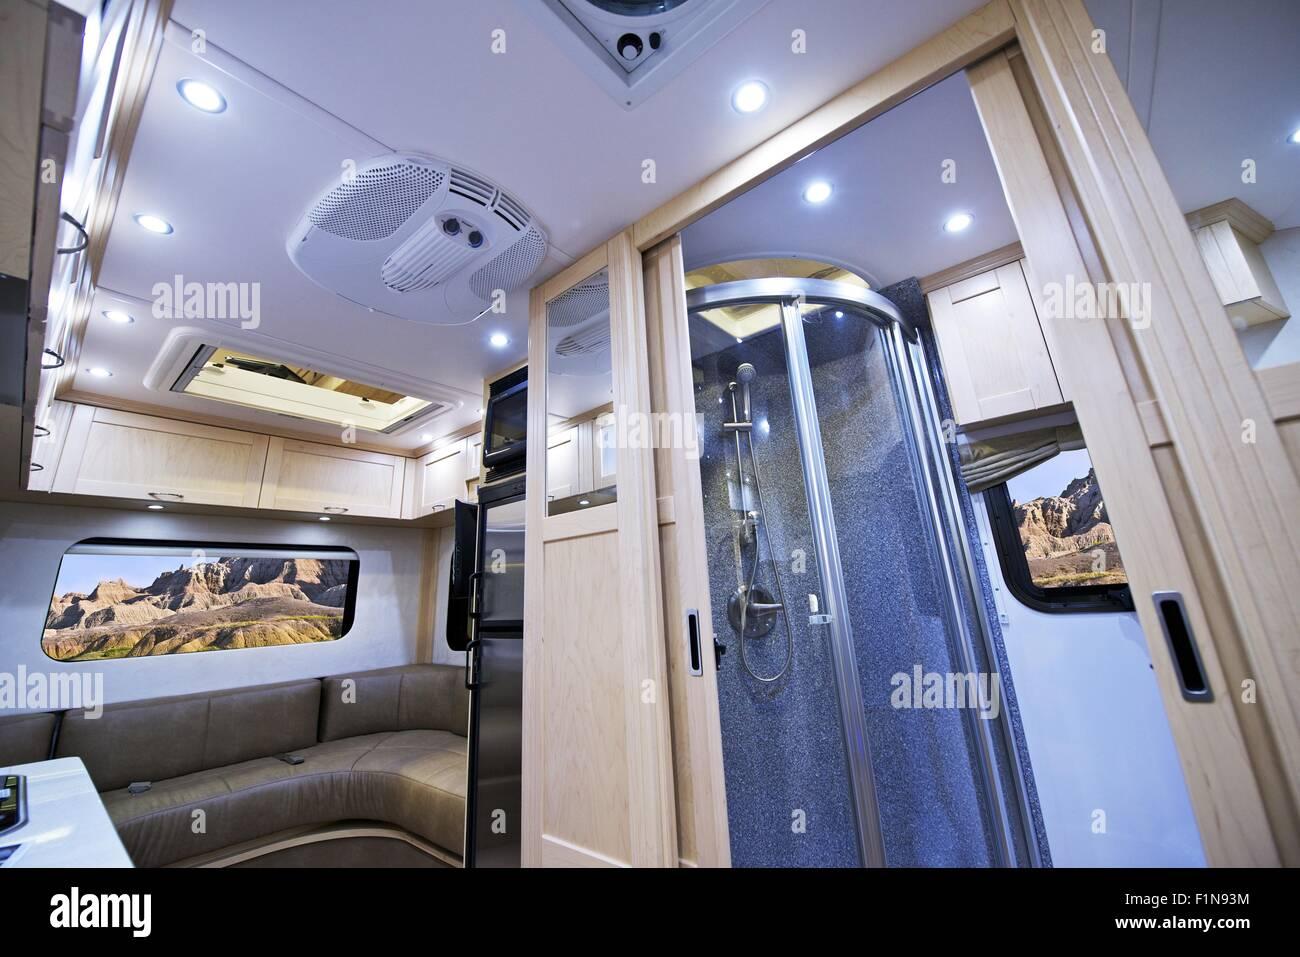 Motorhome Interior Small Bathroom With Shower And Sleeping Area Class B